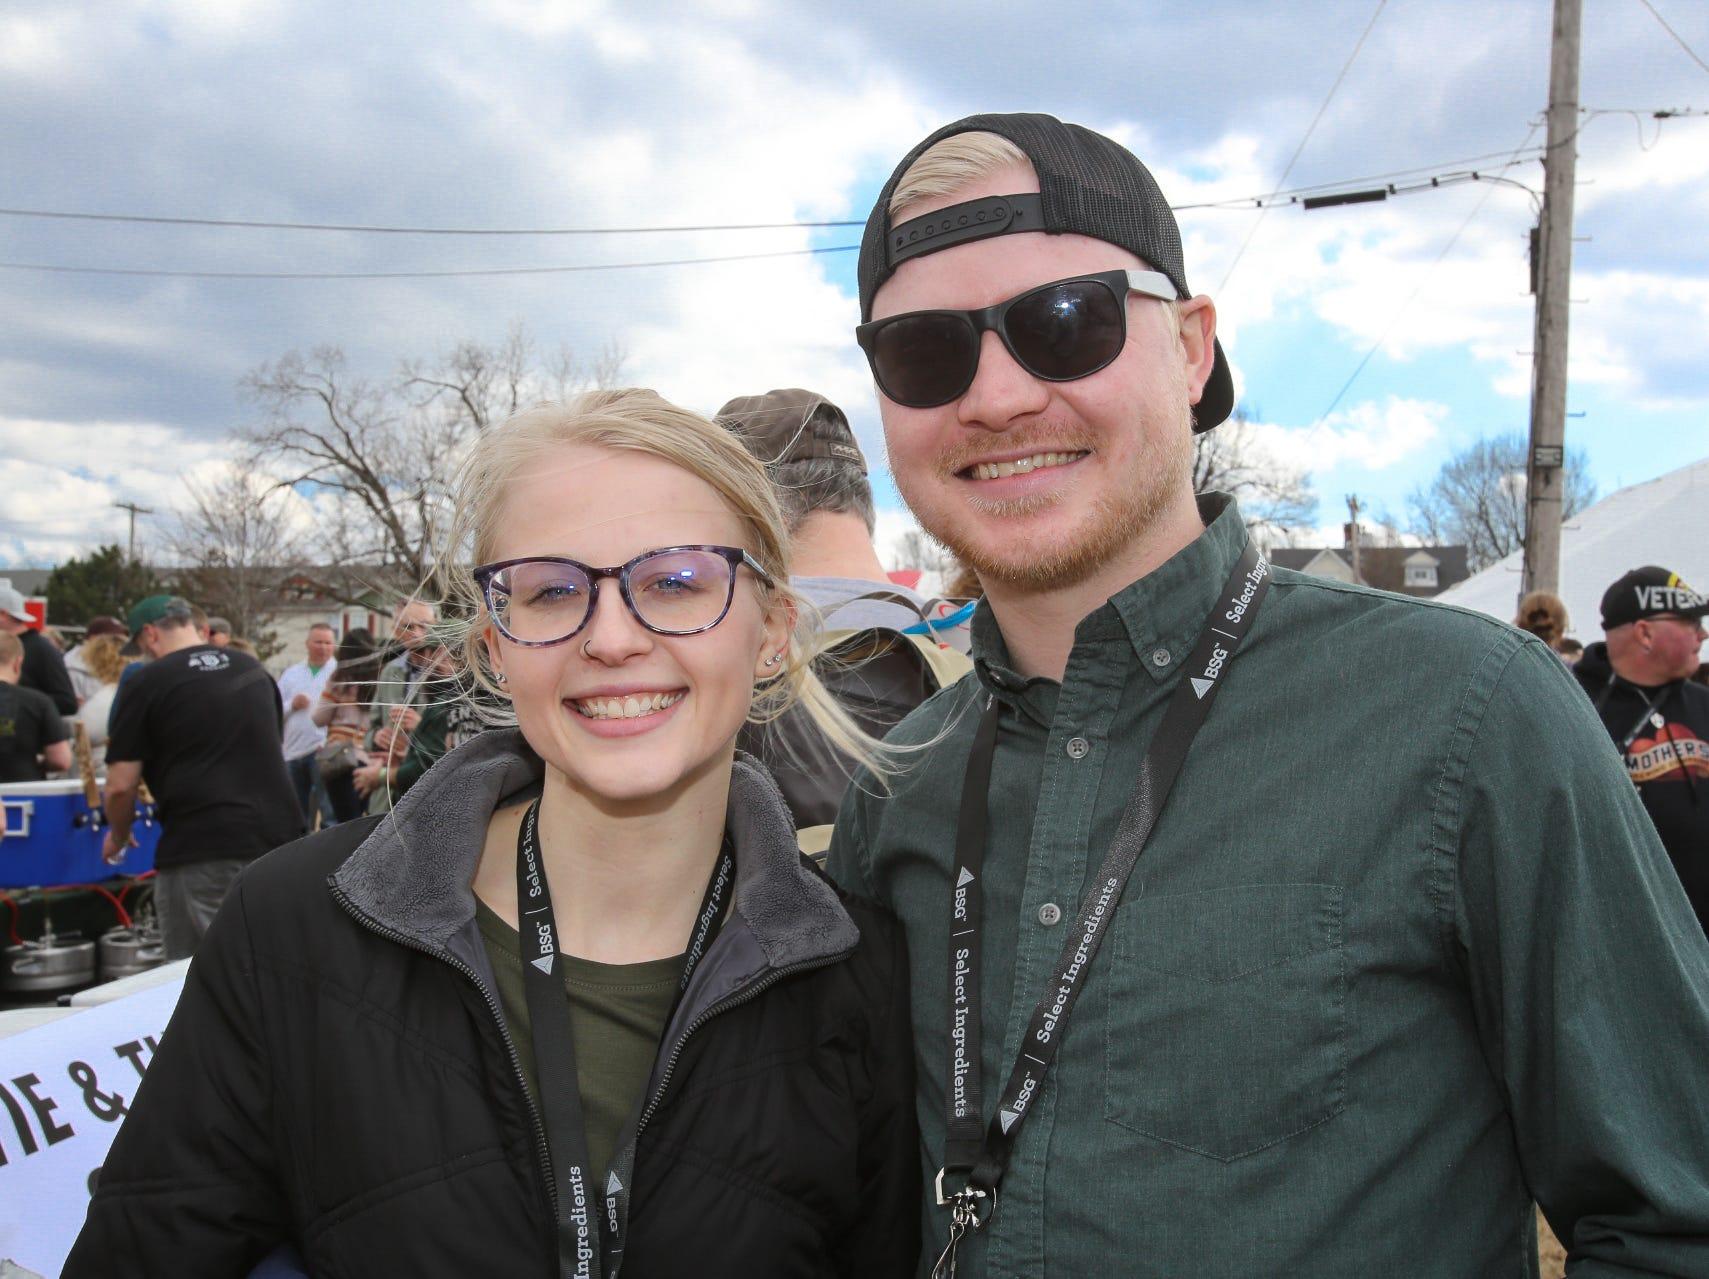 Emma Schupbach and Dylan Corbett